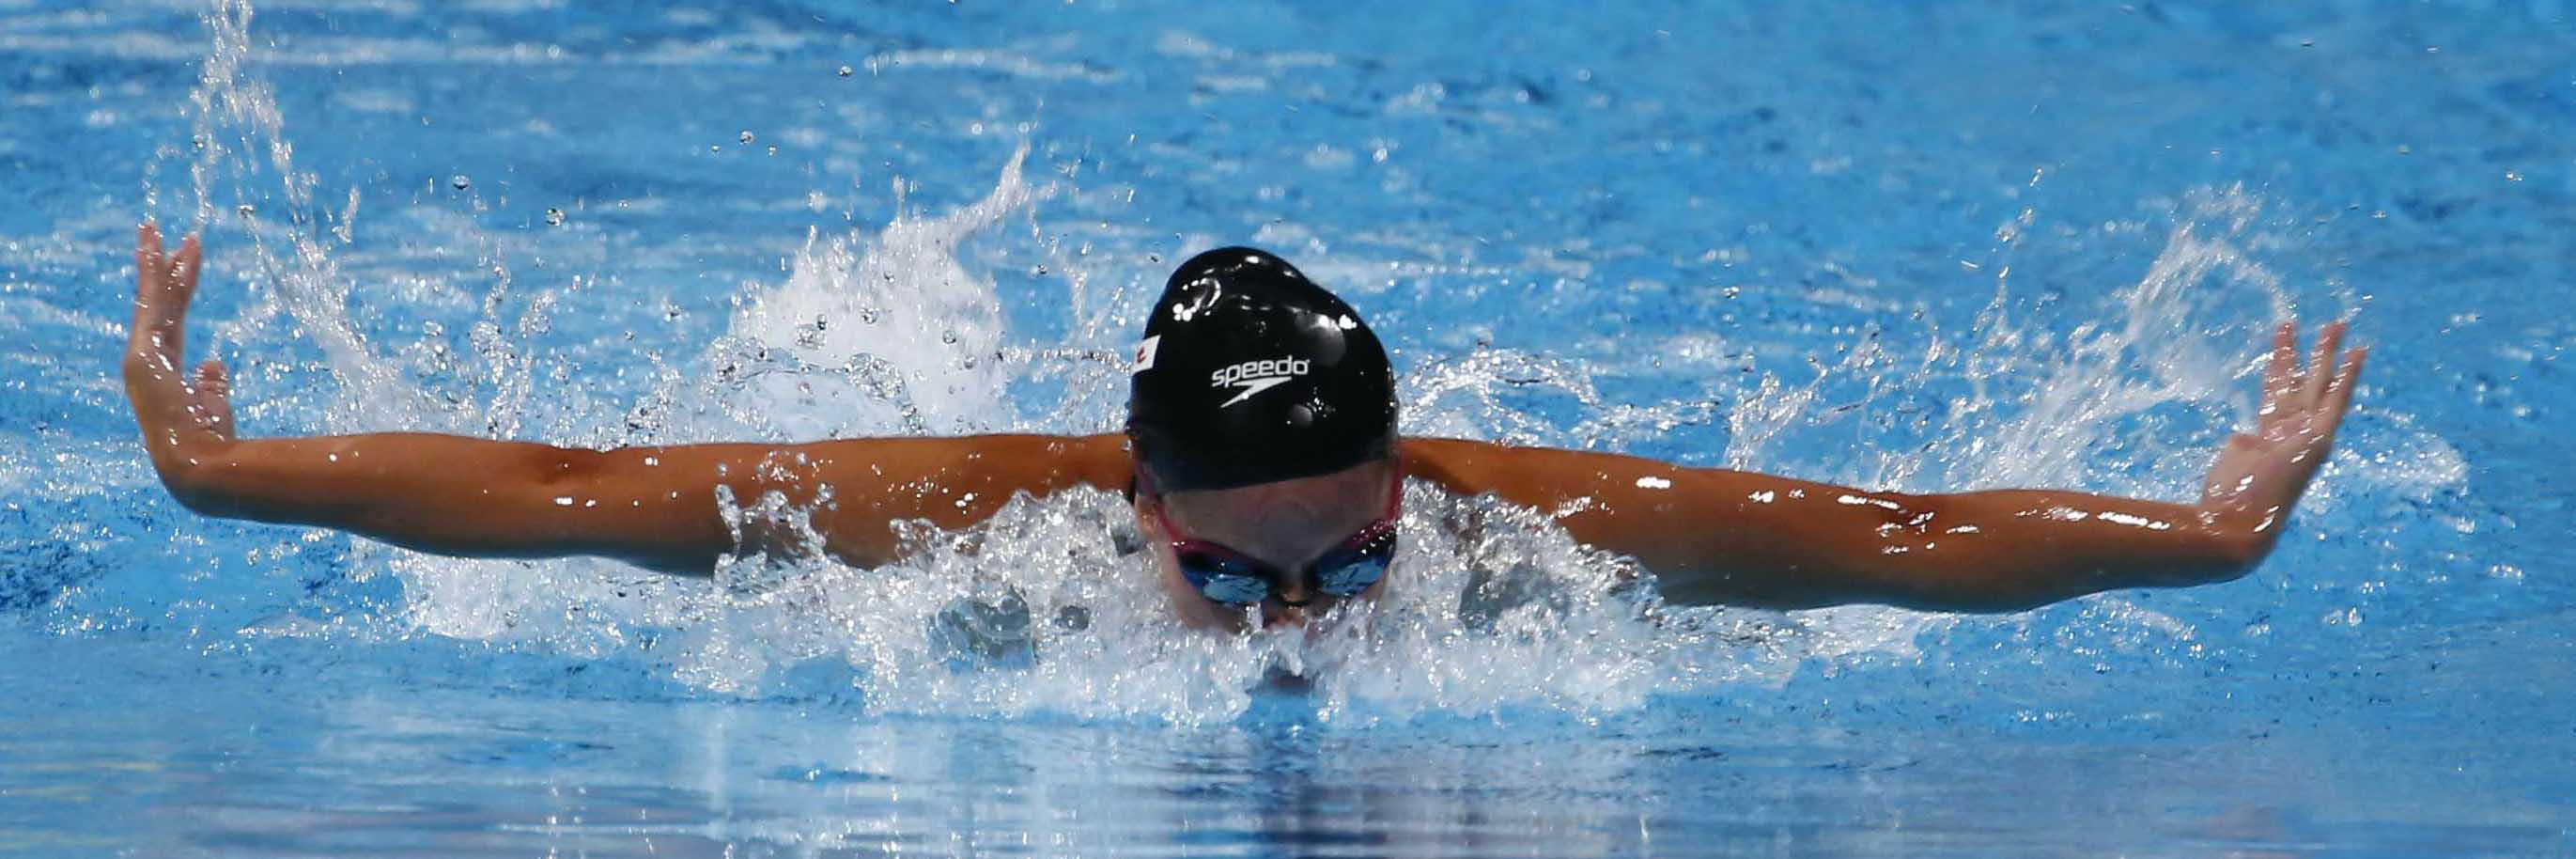 American Samoan 200m Individual Medley Loreen Whitfield